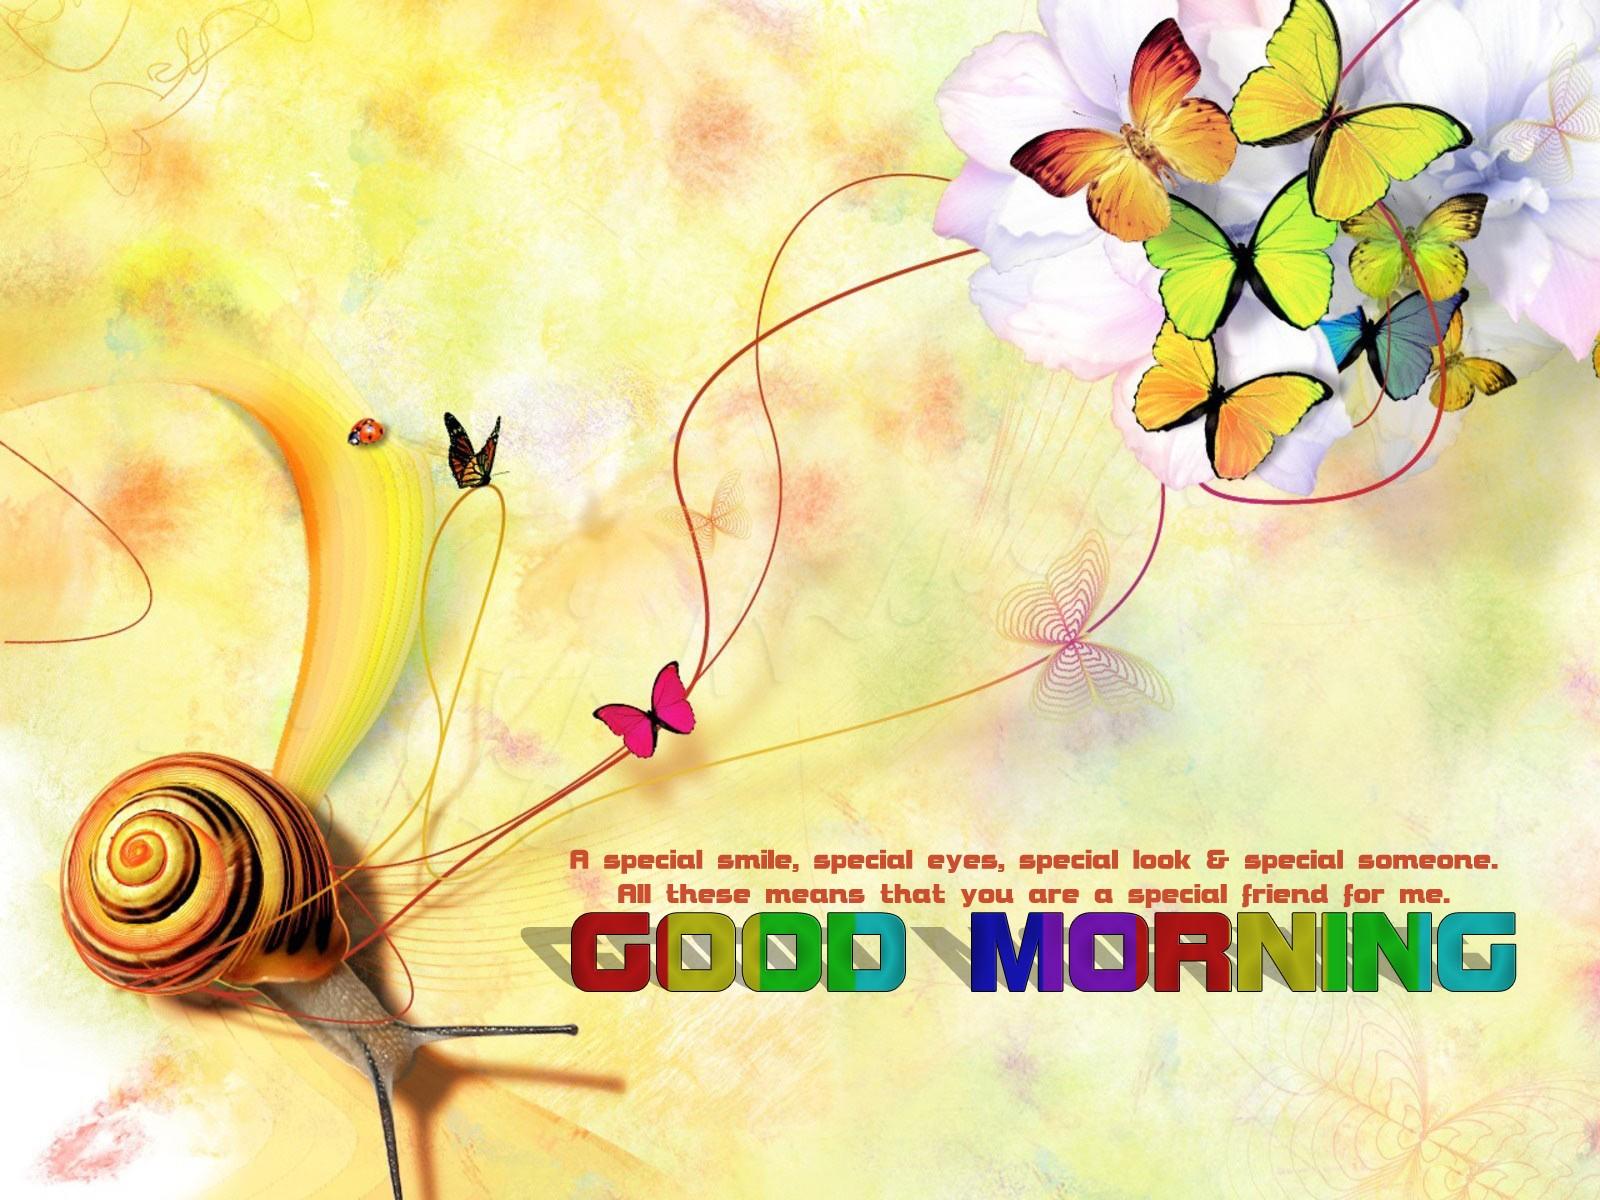 Good Morning Wallpaper HD Butterfly